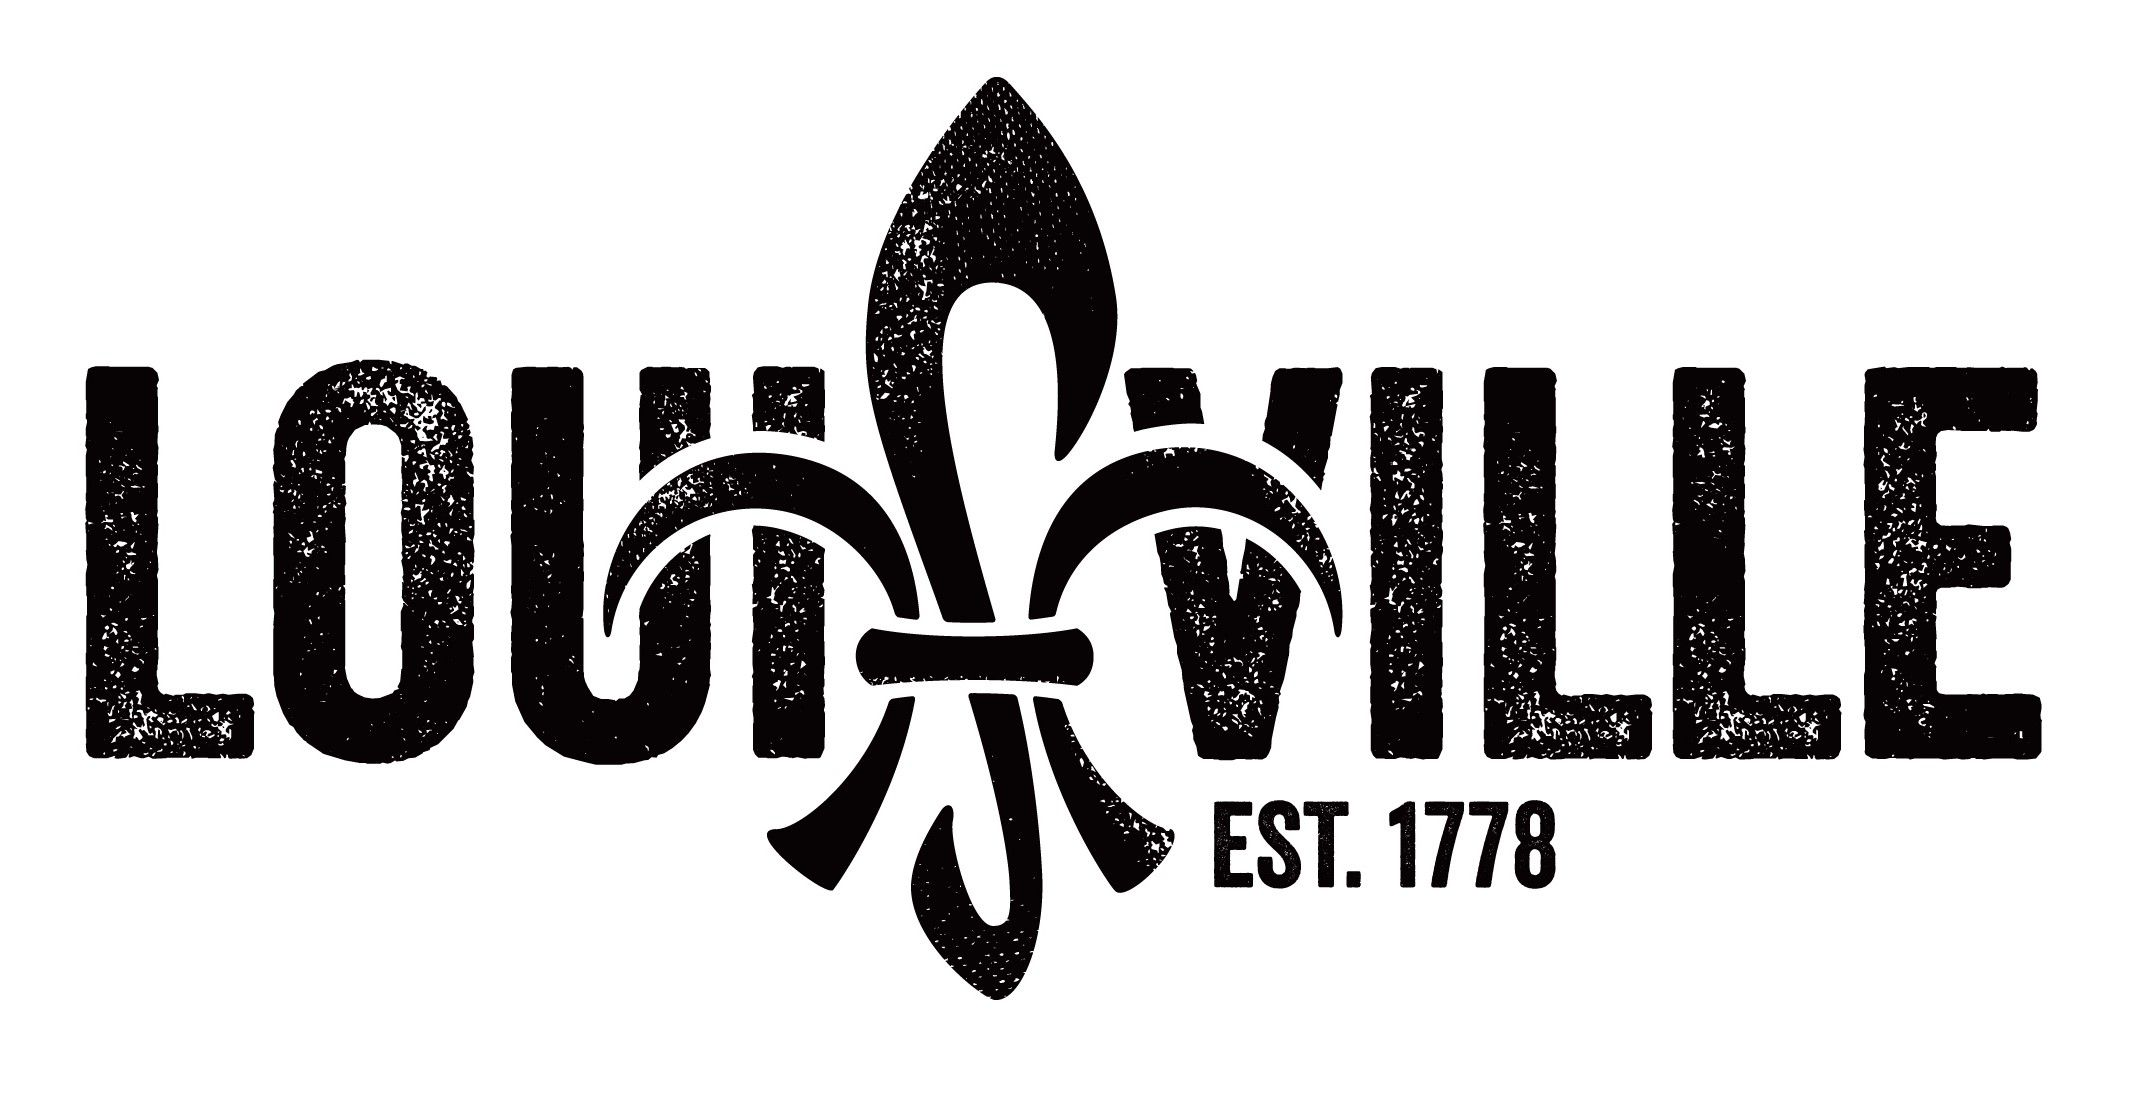 https://www.gotolouisville.com/